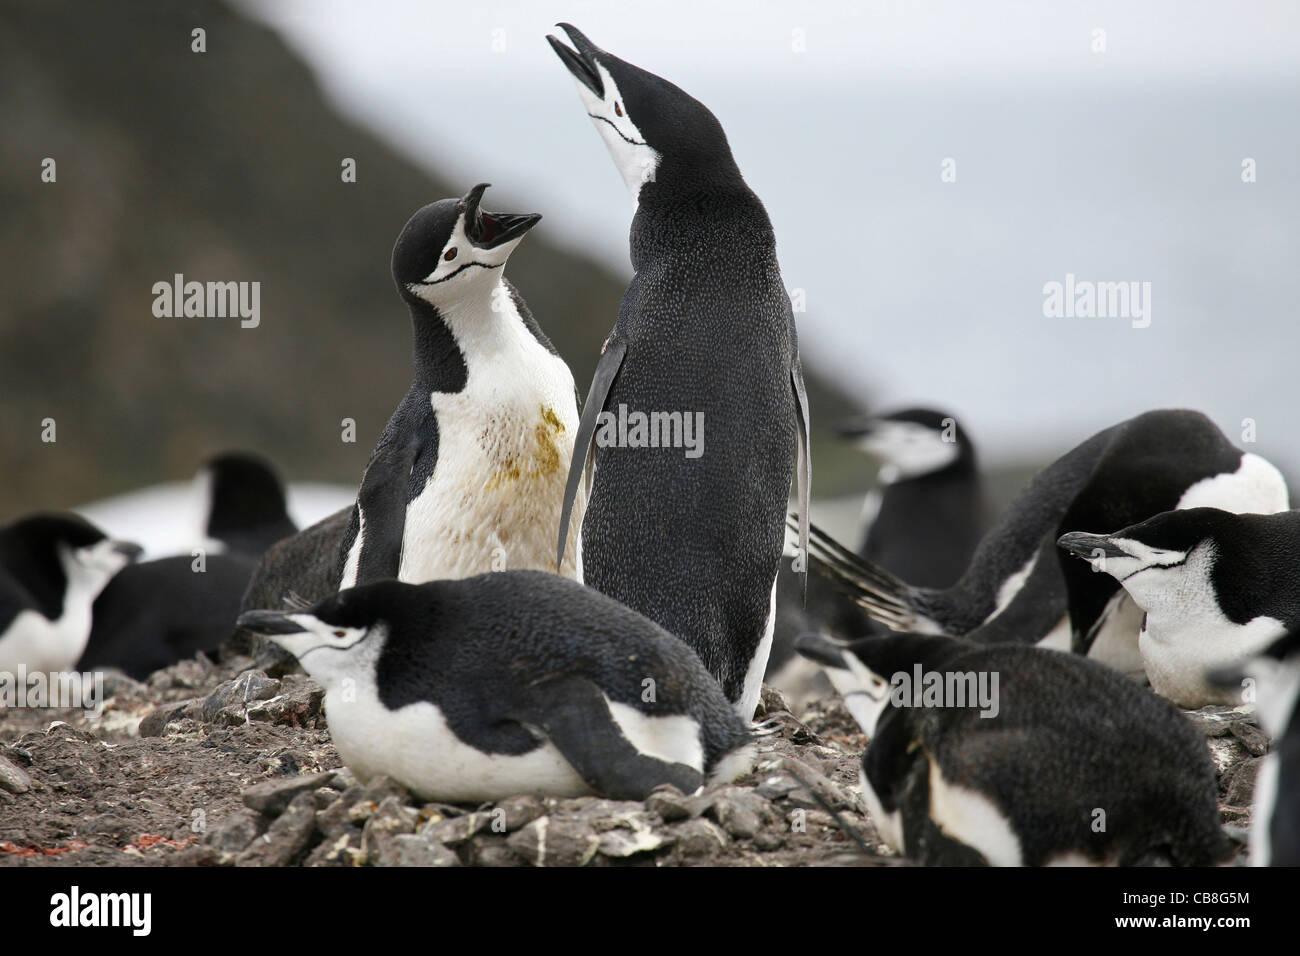 Chinstrap penguin (Pygoscelis antarcticus) protecting nest against intruder, South Shetland Islands, Antarctica - Stock Image